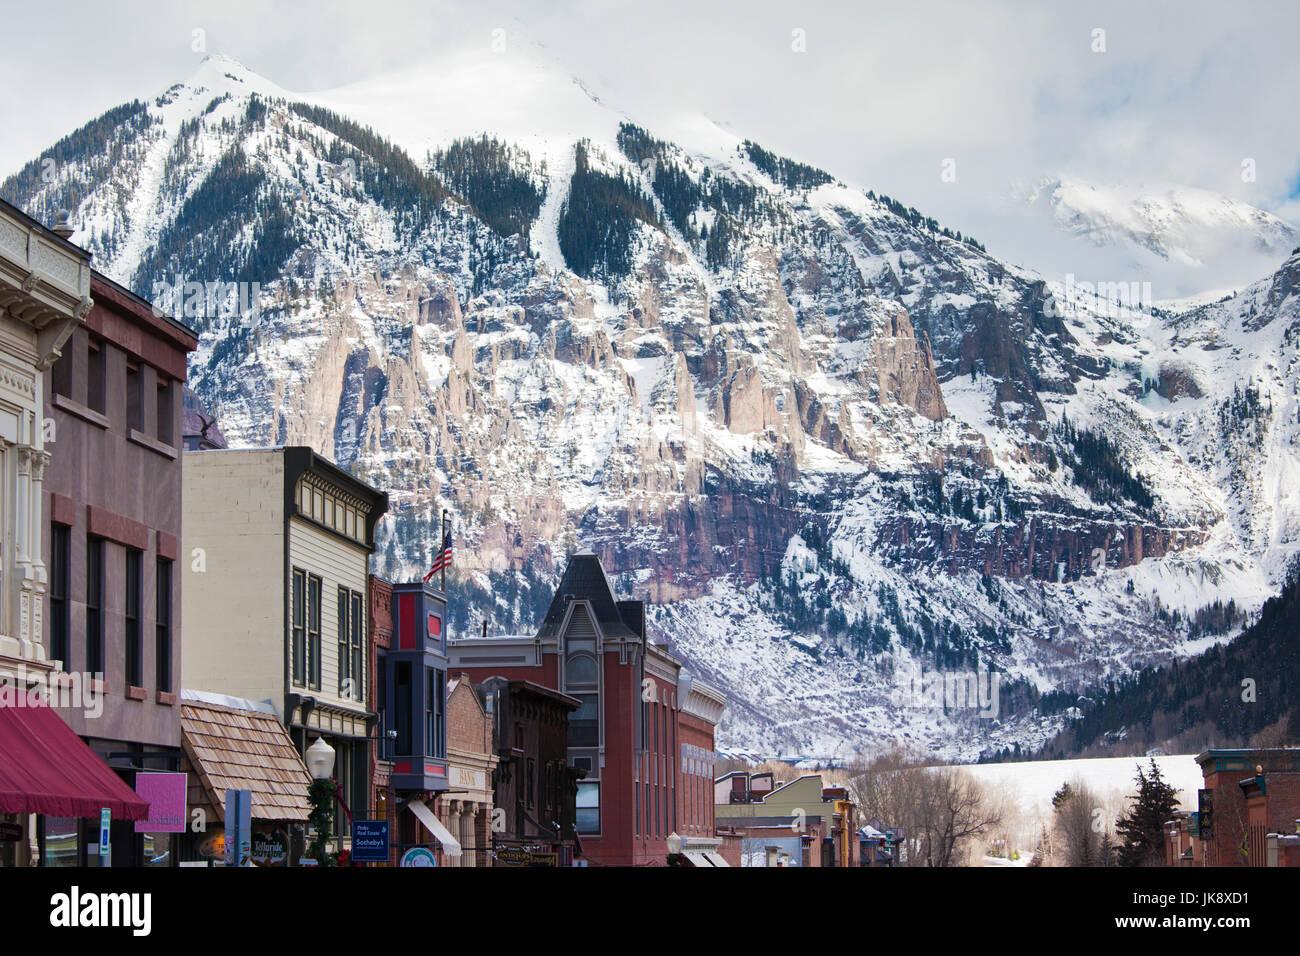 USA, Colorado, Telluride, Main Street and Ajax Peak, winter - Stock Image